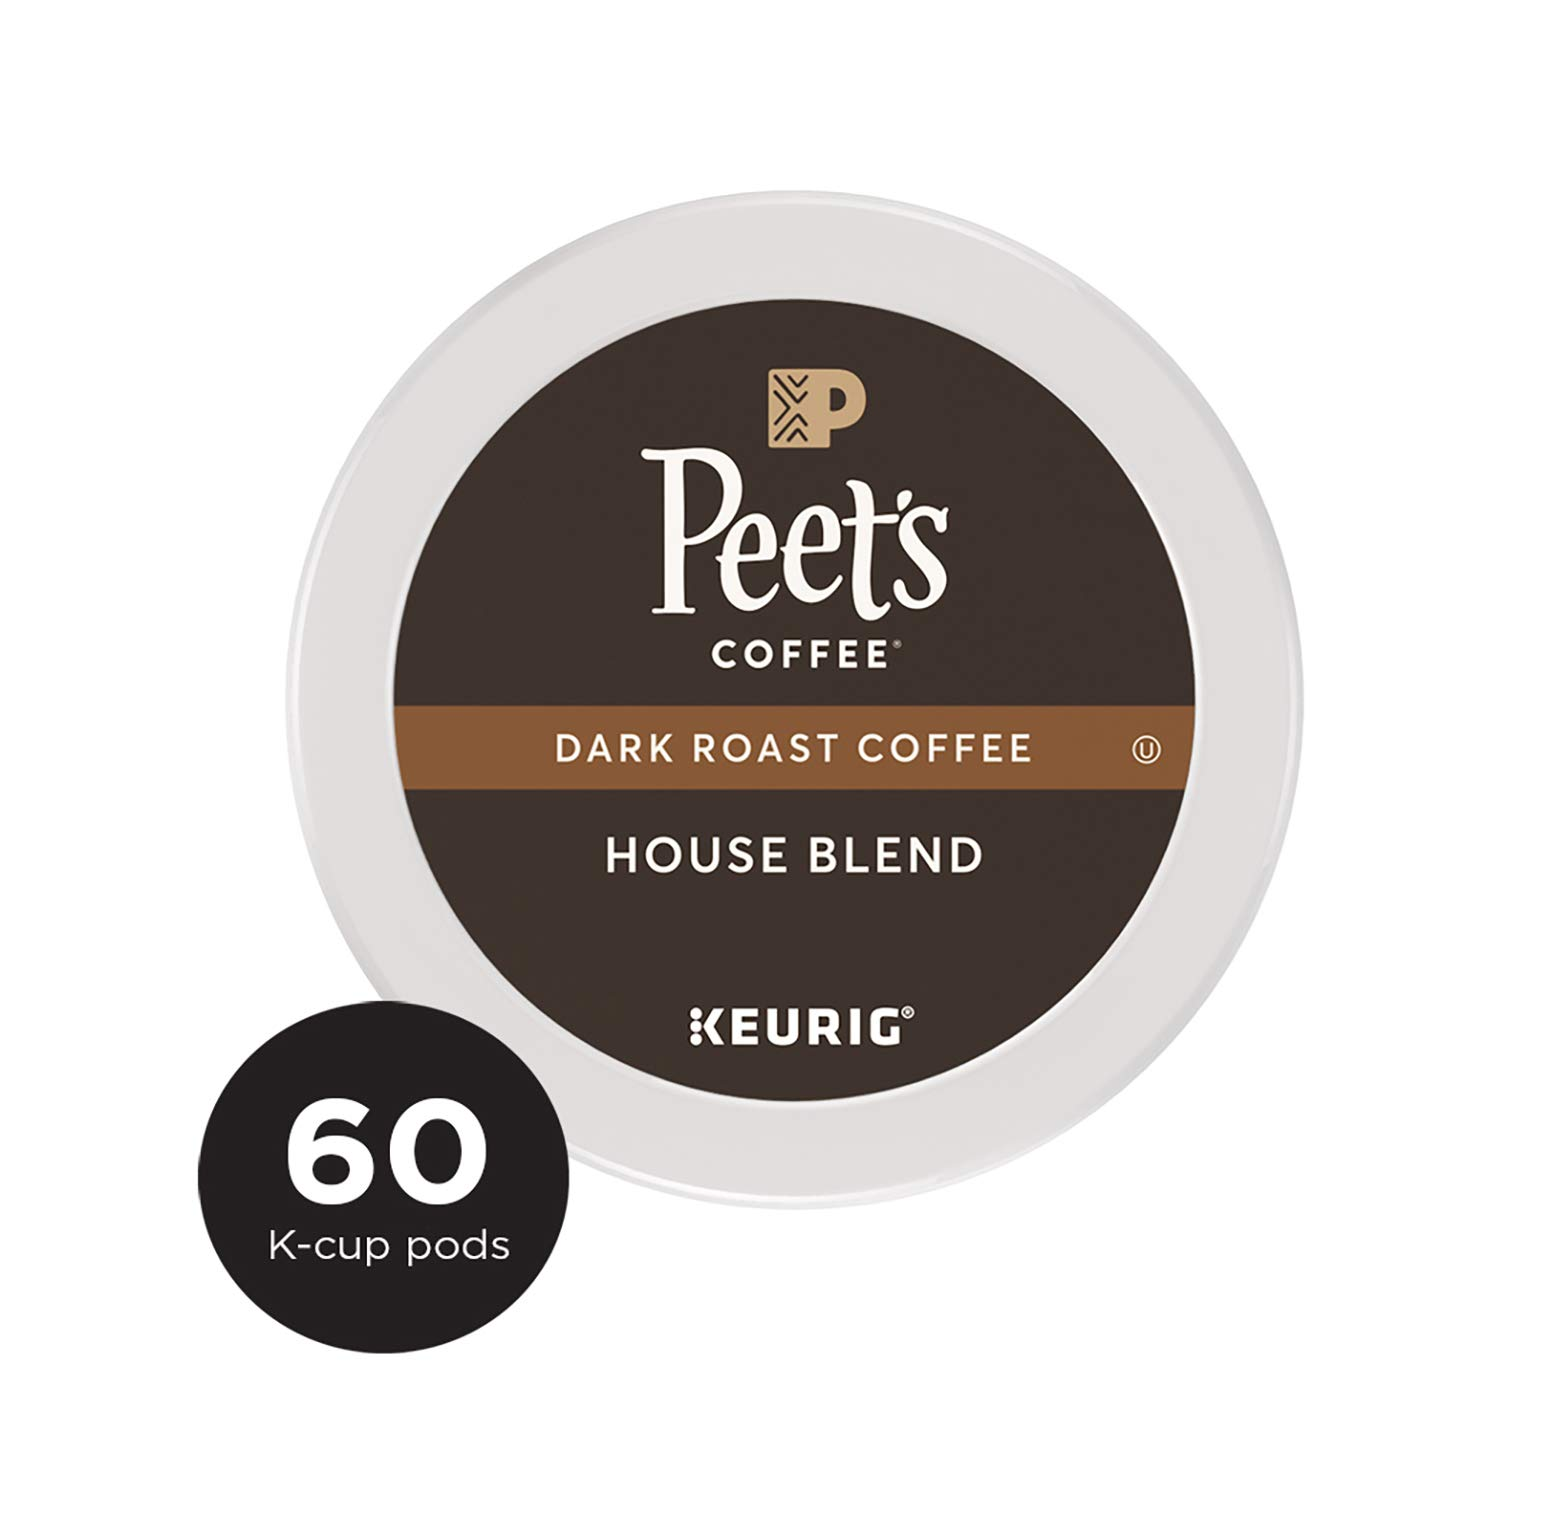 Peet's Coffee House Blend, Dark Roast, 60 Count Single Serve K-Cup Coffee Pods for Keurig Coffee Maker